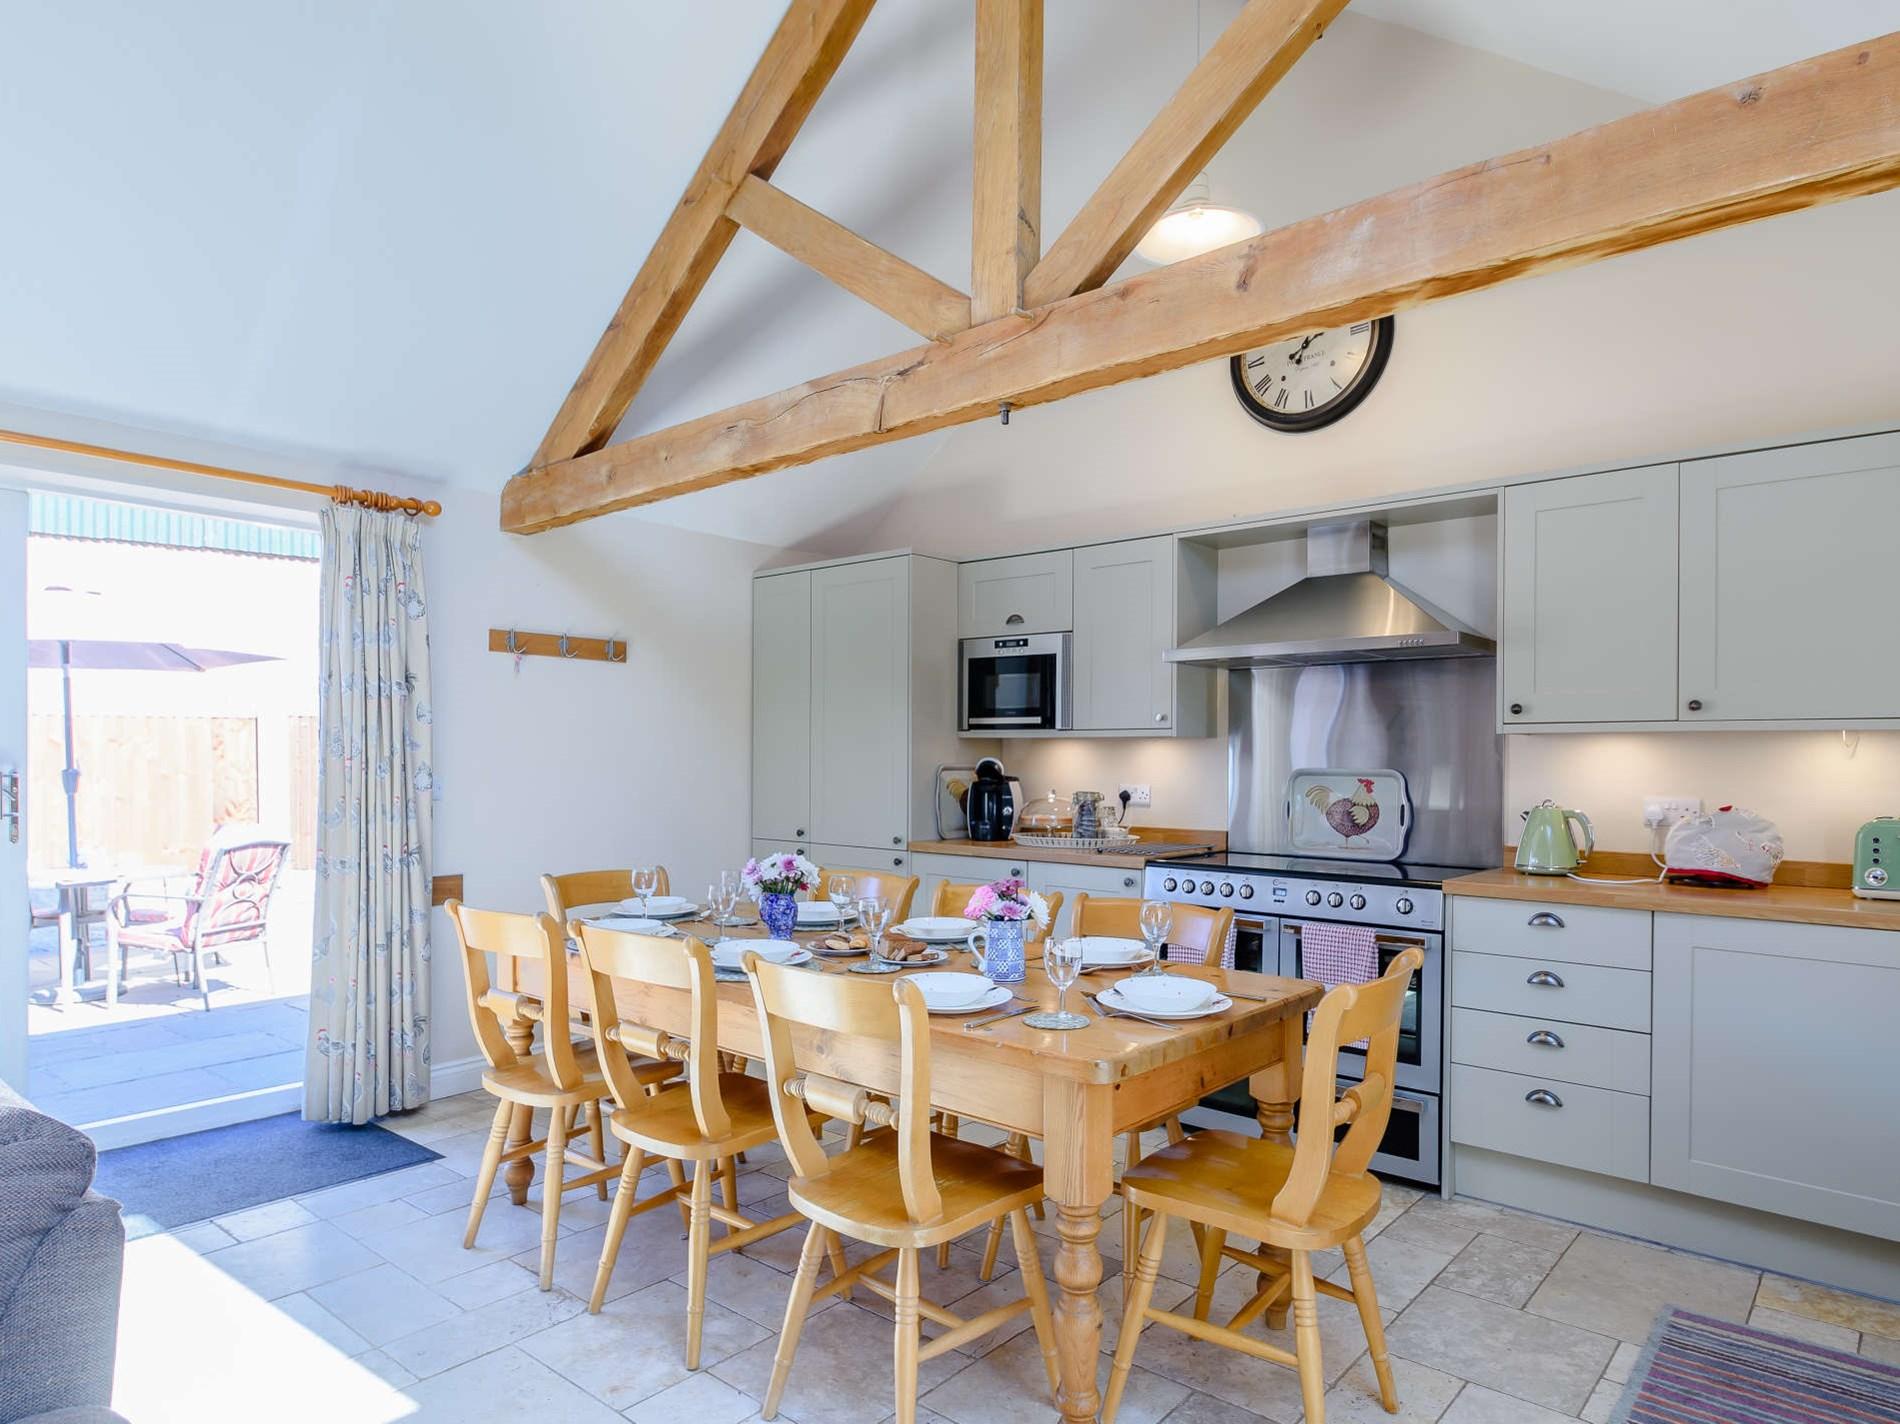 3 Bedroom Barn in North Yorkshire, Yorkshire Dales